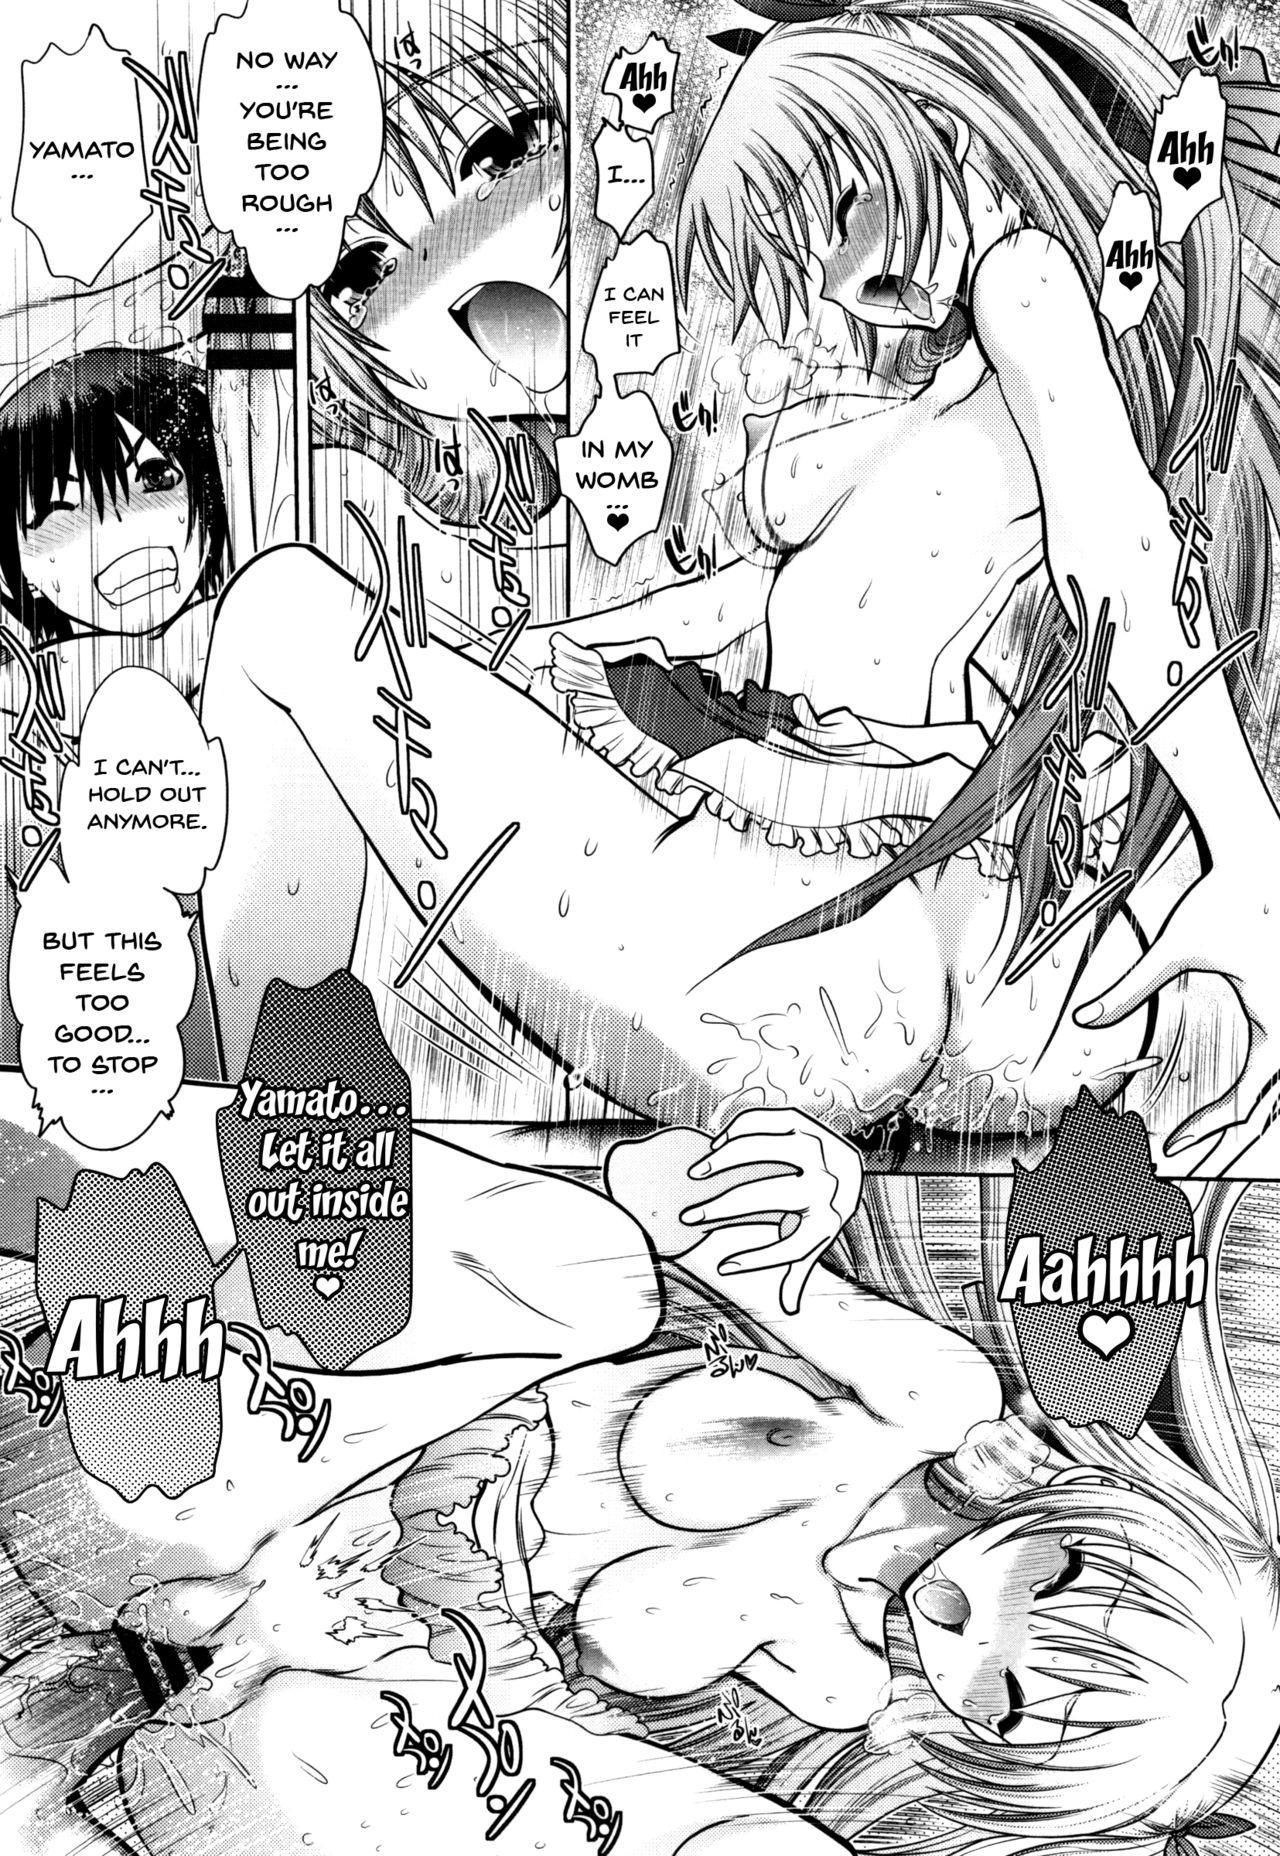 [Yagami Dai] Maji de Watashi ni Koi Shinasai! S Adult Edition ~Shodai Heroine Hen~ | Fall in Love With Me For Real! Ch.1-8 [English] {Doujins.com} 162